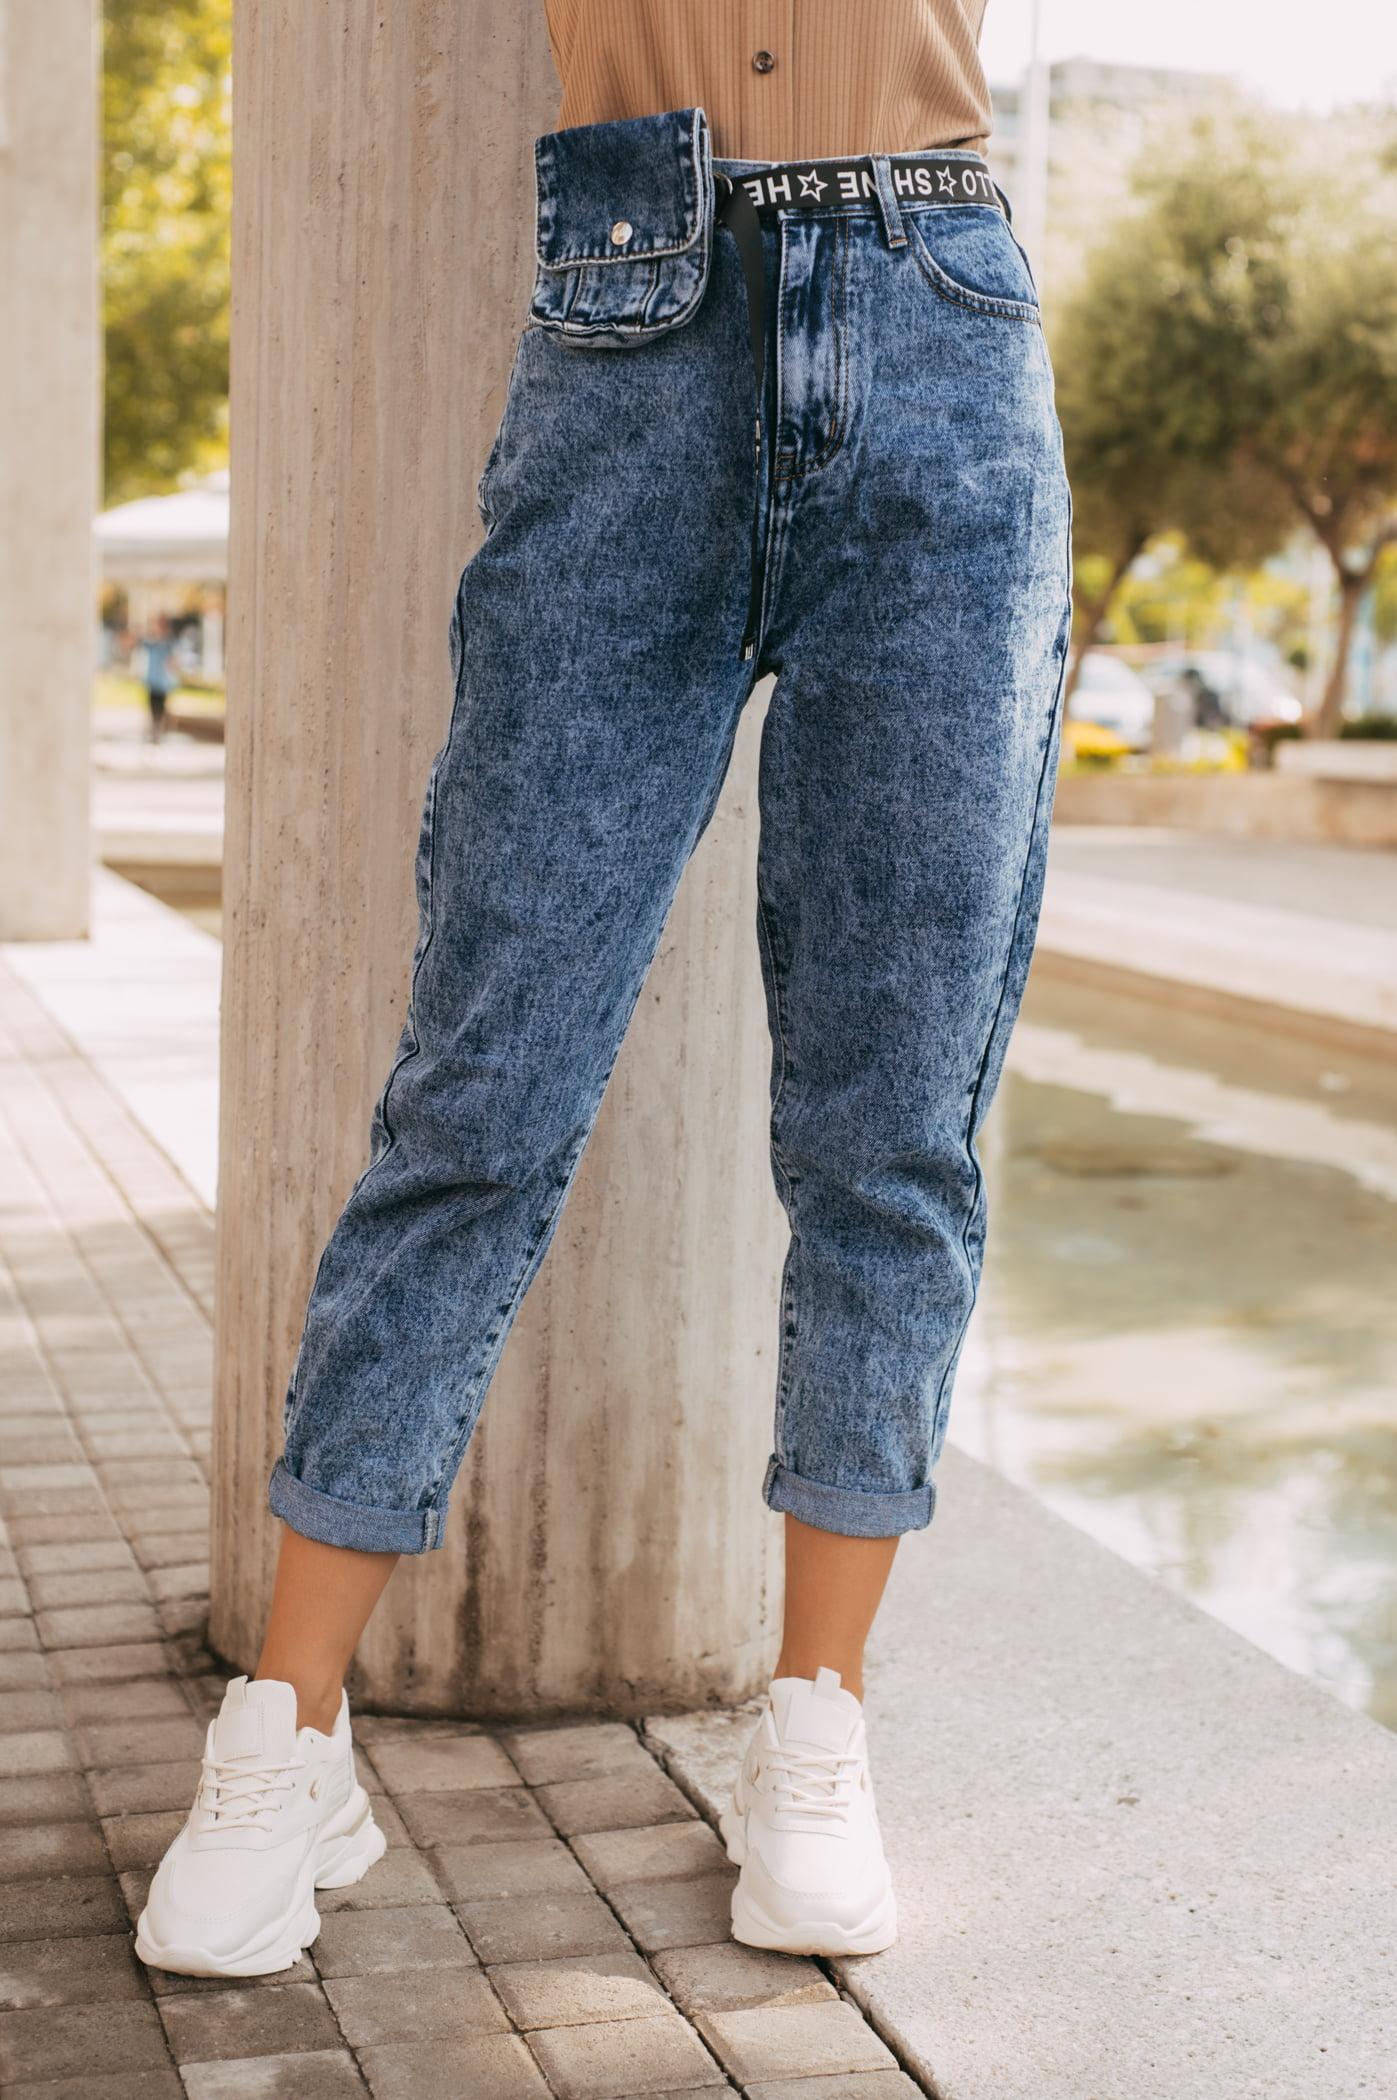 antithesis-clothing-jean-mom-fit-me-tsantaki (9)